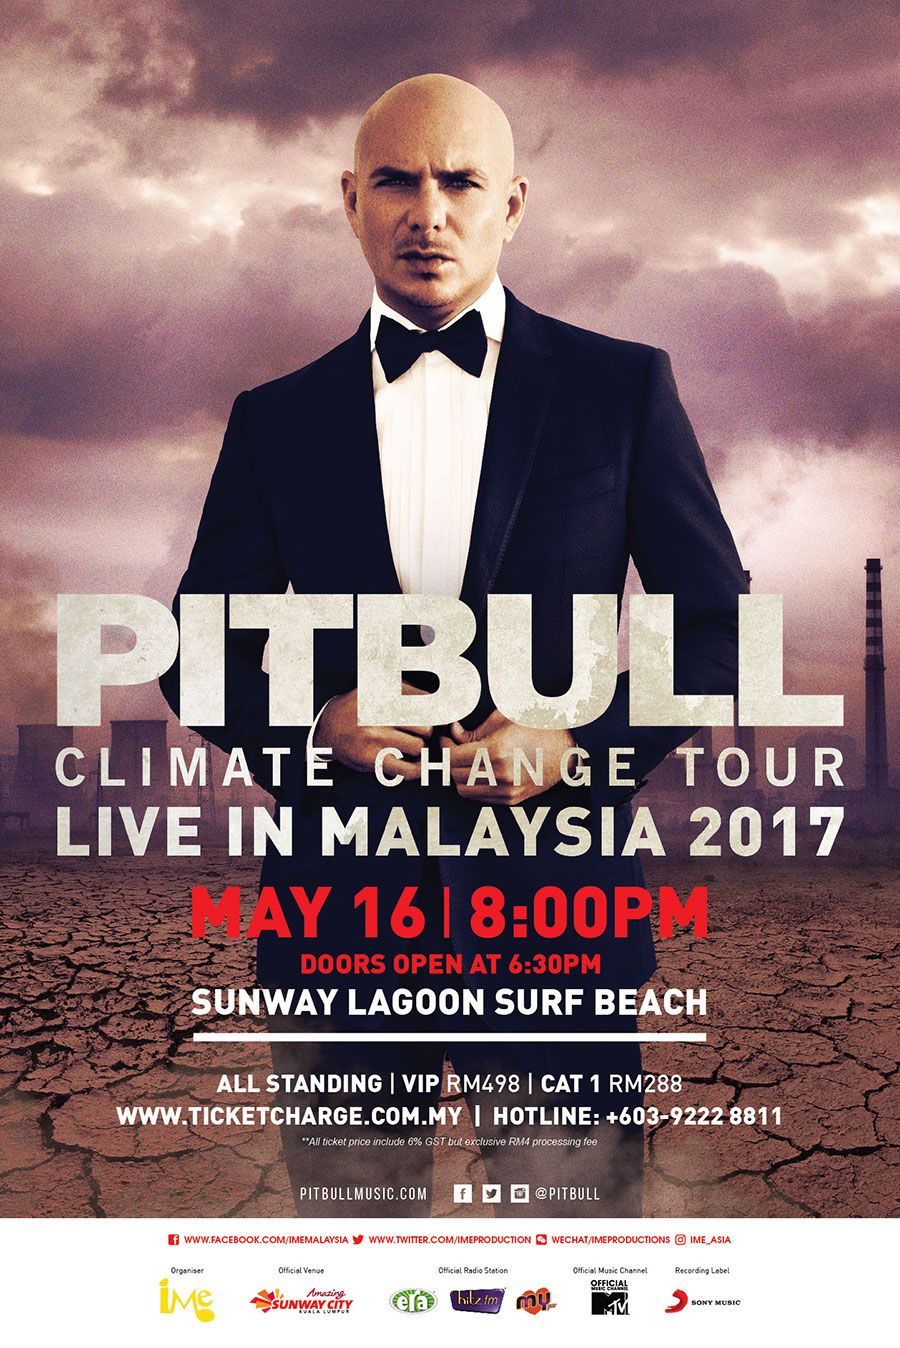 CONTEST] Win Passes To Catch Pitbull Live In Malaysia